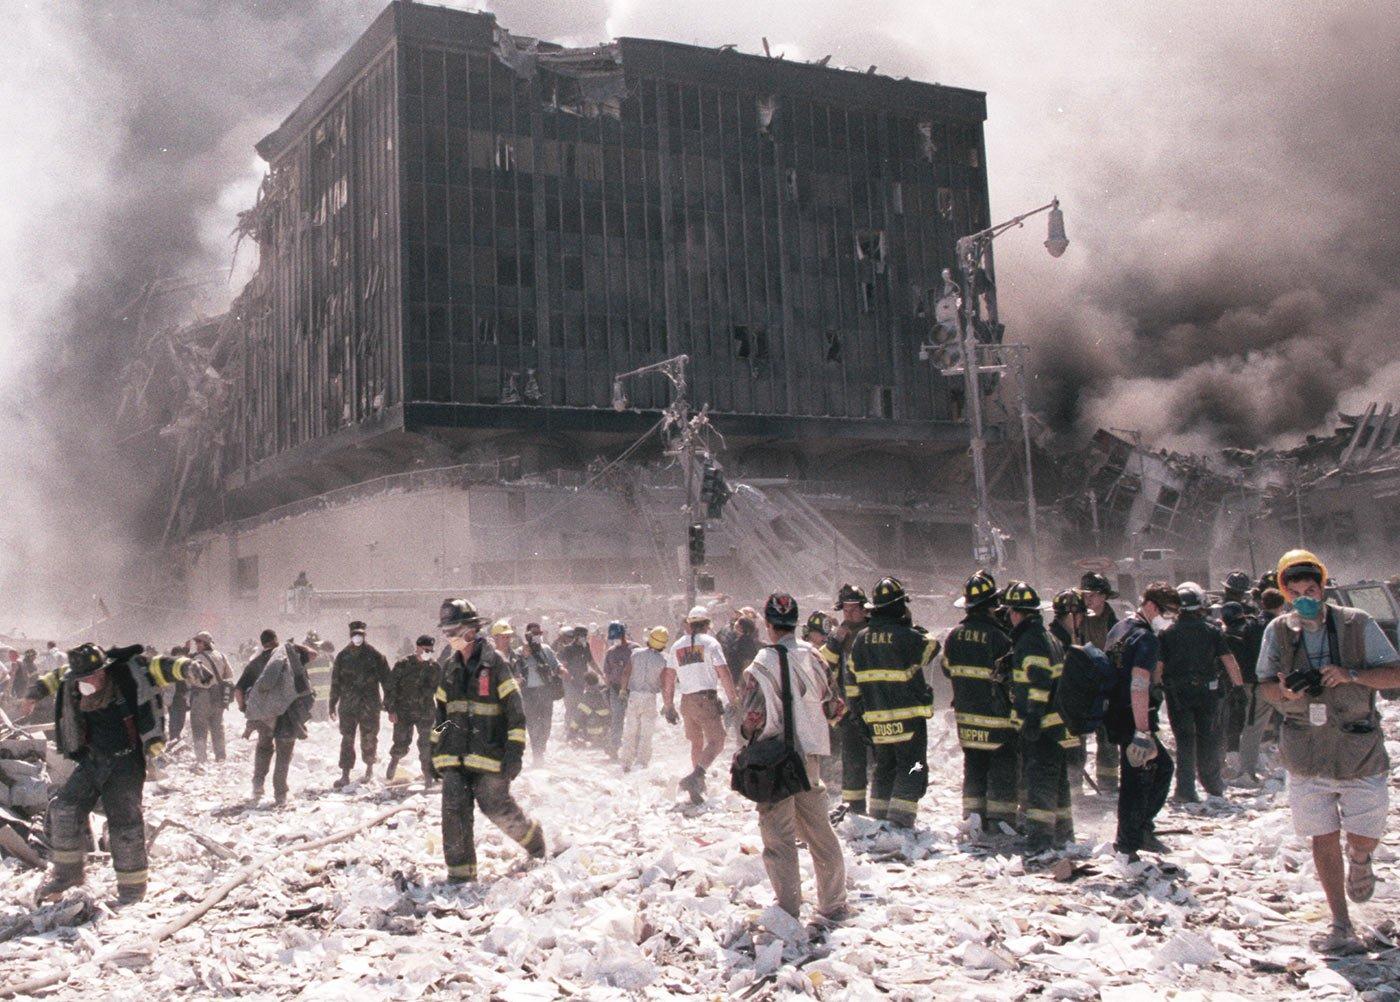 World Trade Center 9/11